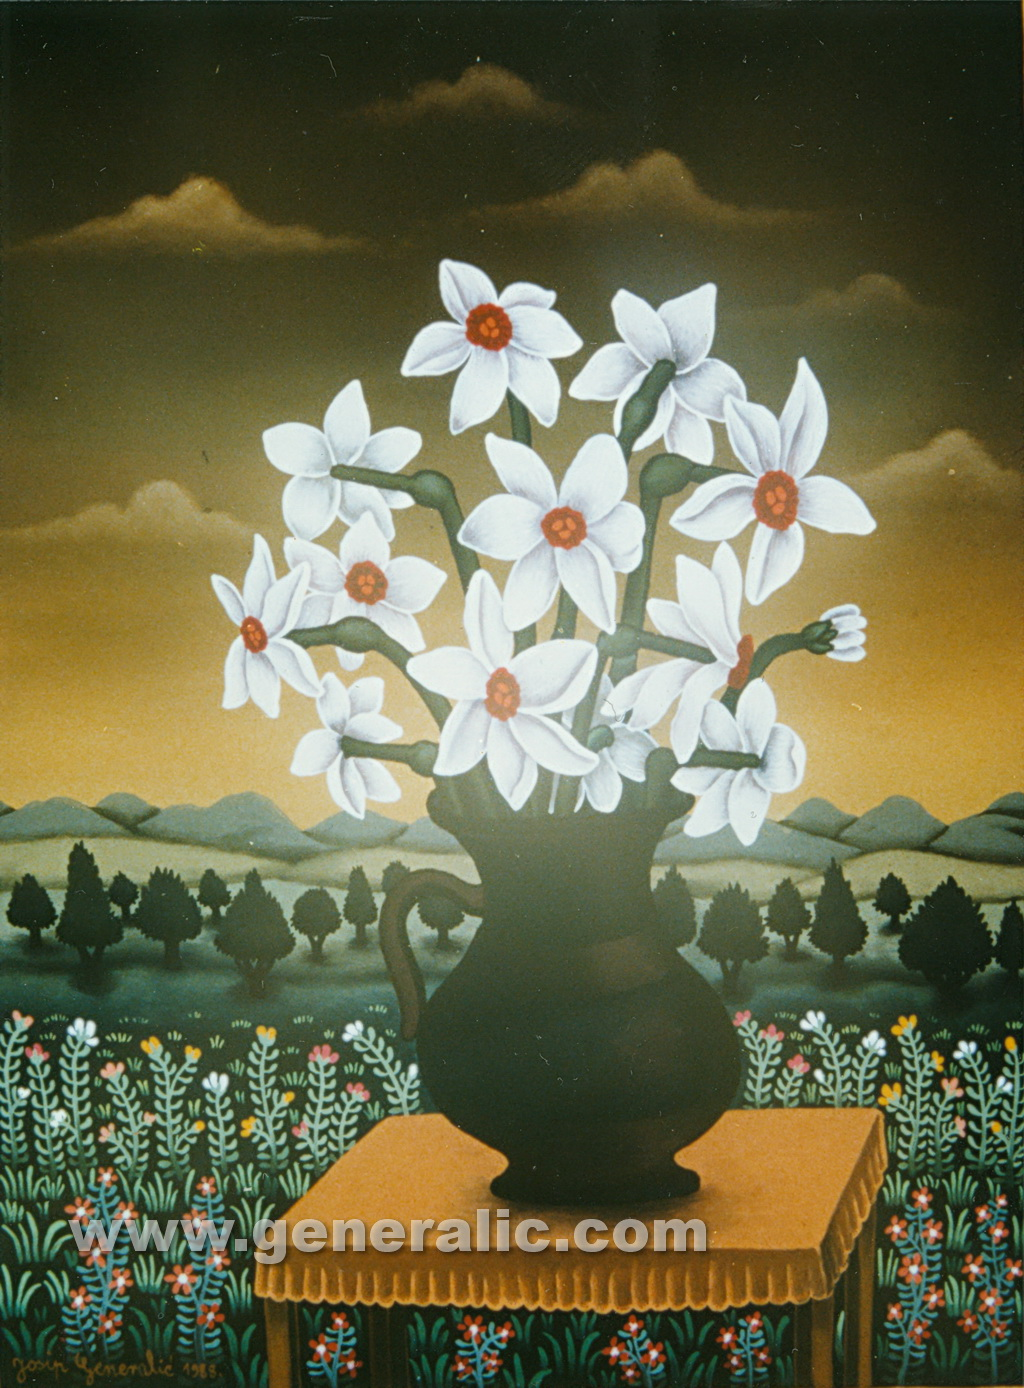 Josip Generalic, 1988, White flowers, oil on glass